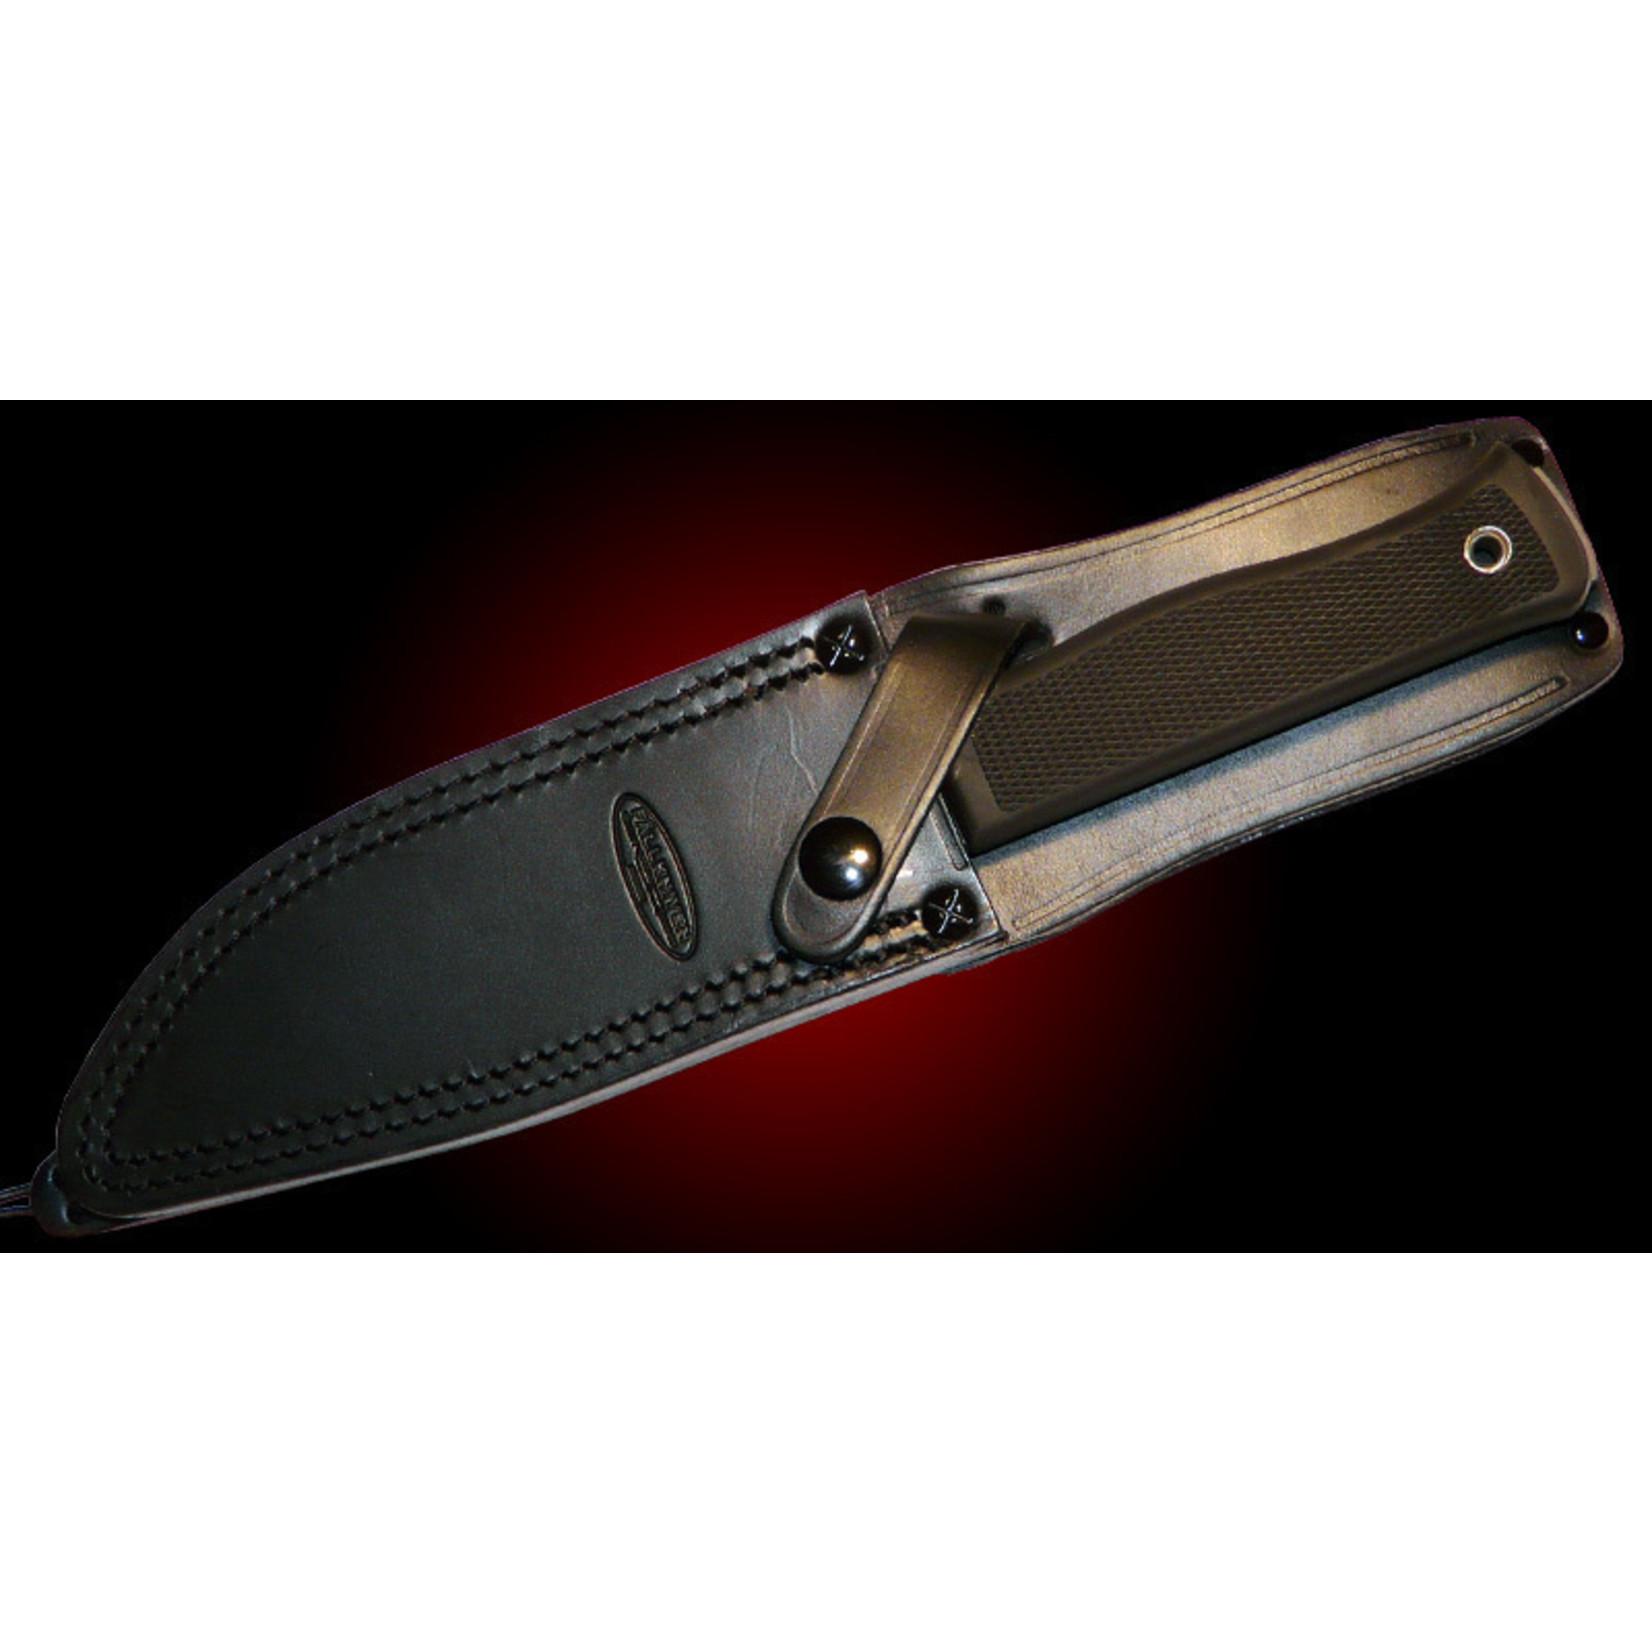 Fallkniven Fallkniven A1 Expedition knife met lederen holster